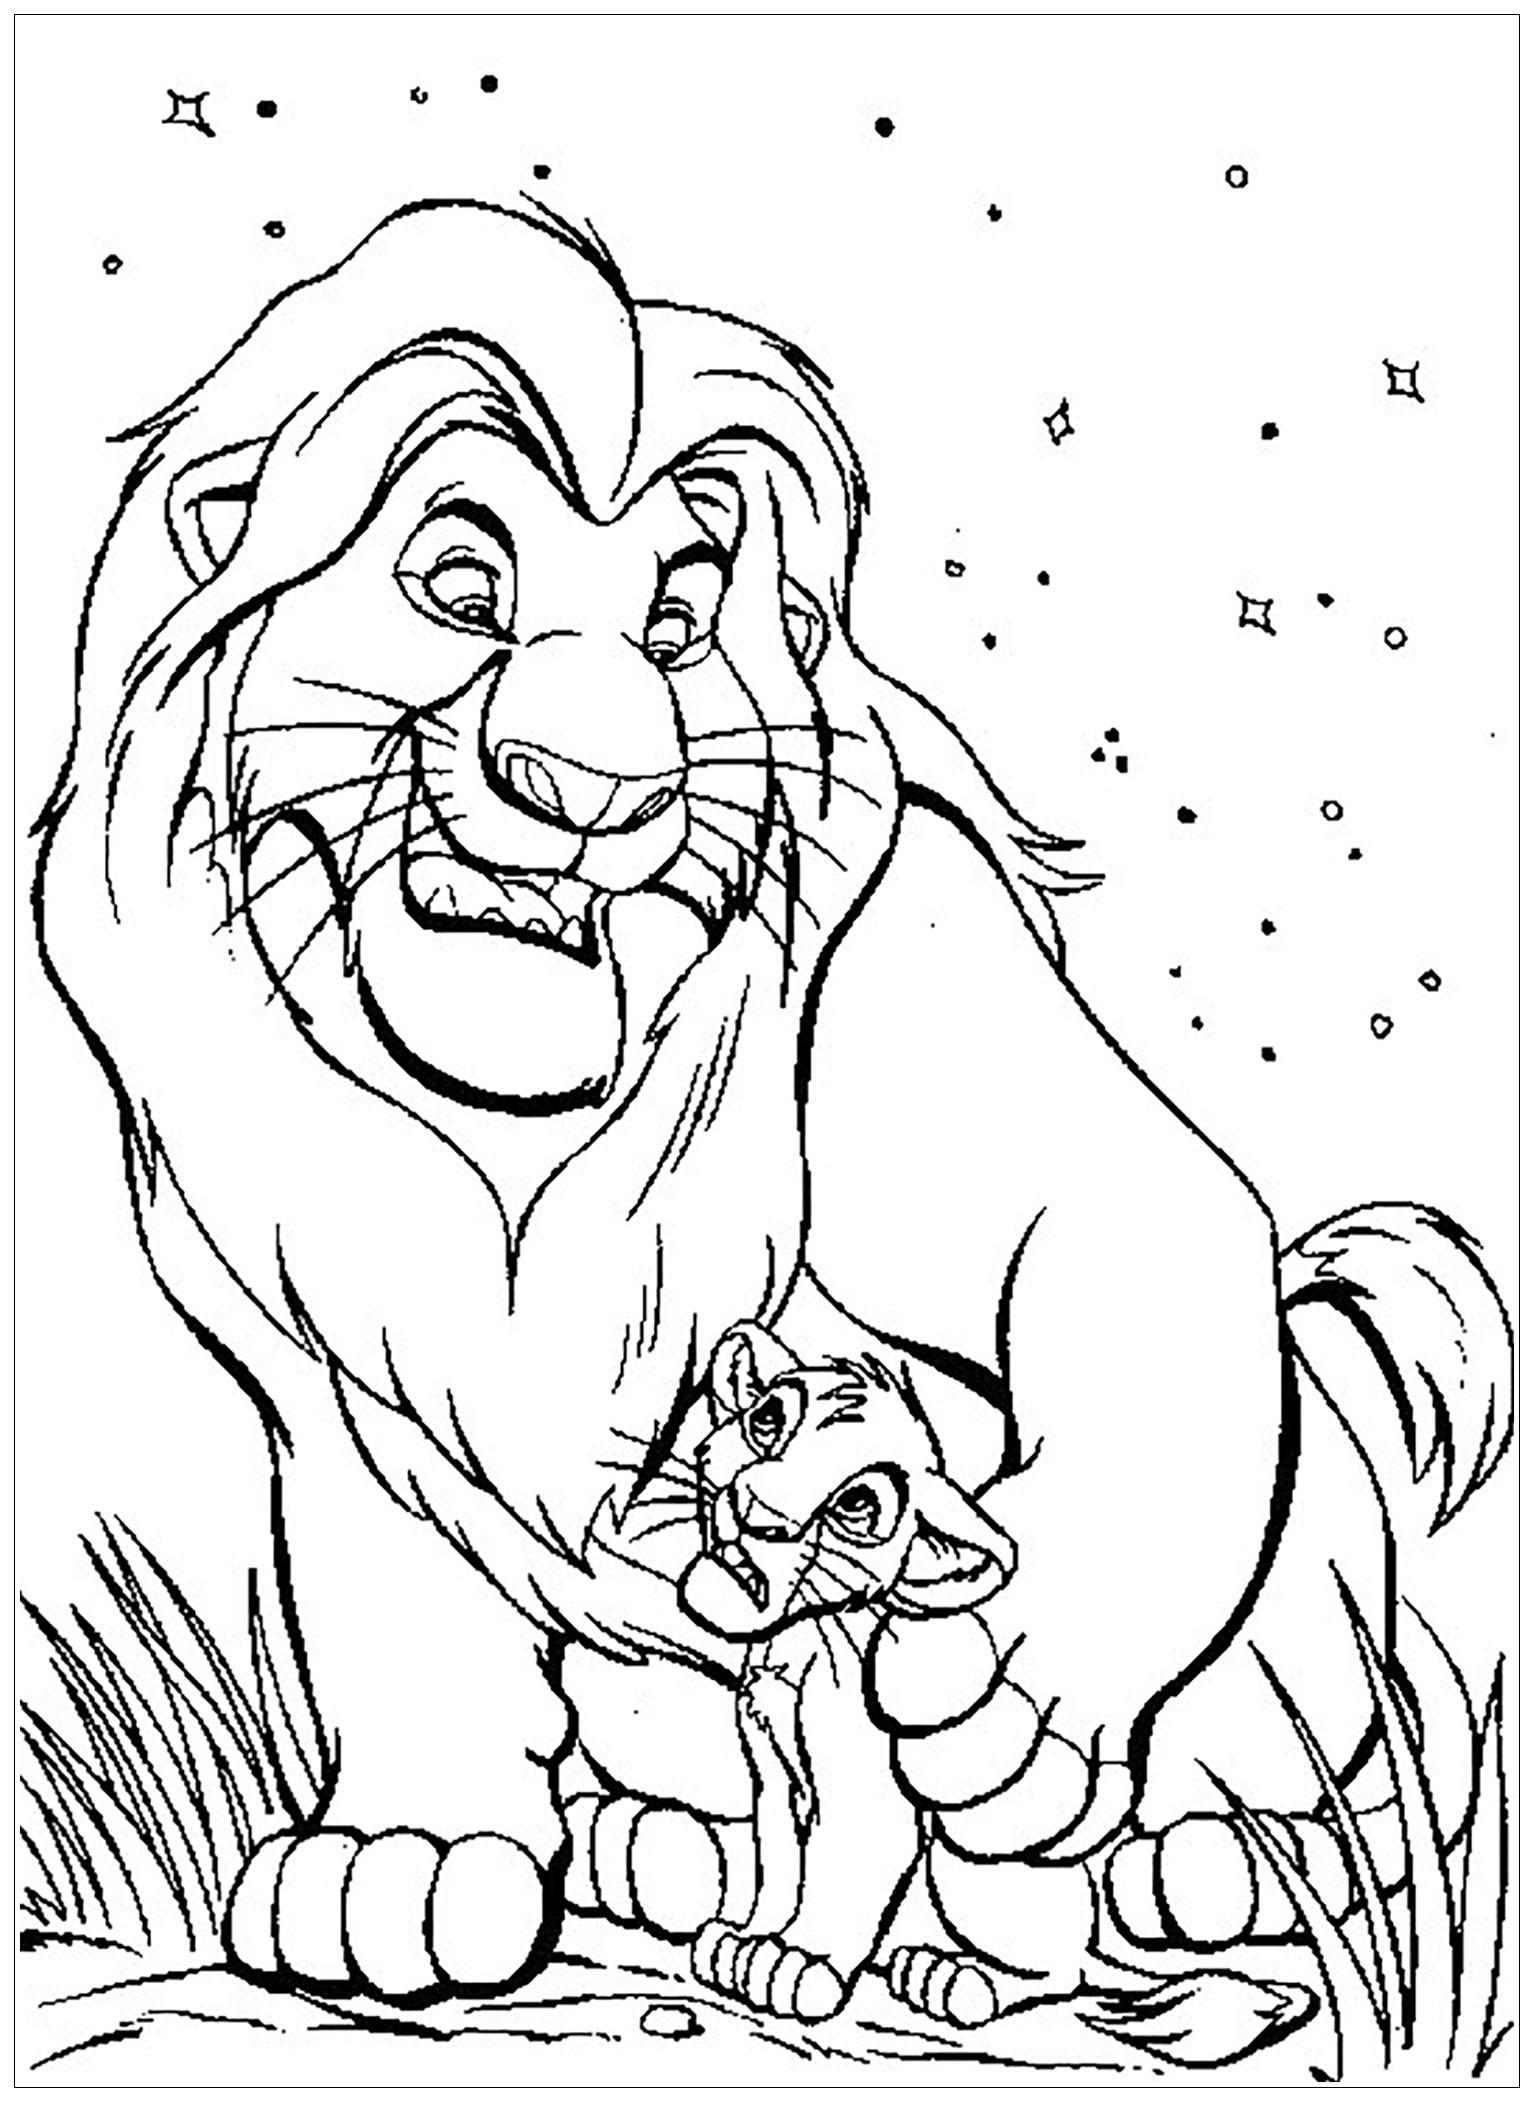 Mufasa With Simba